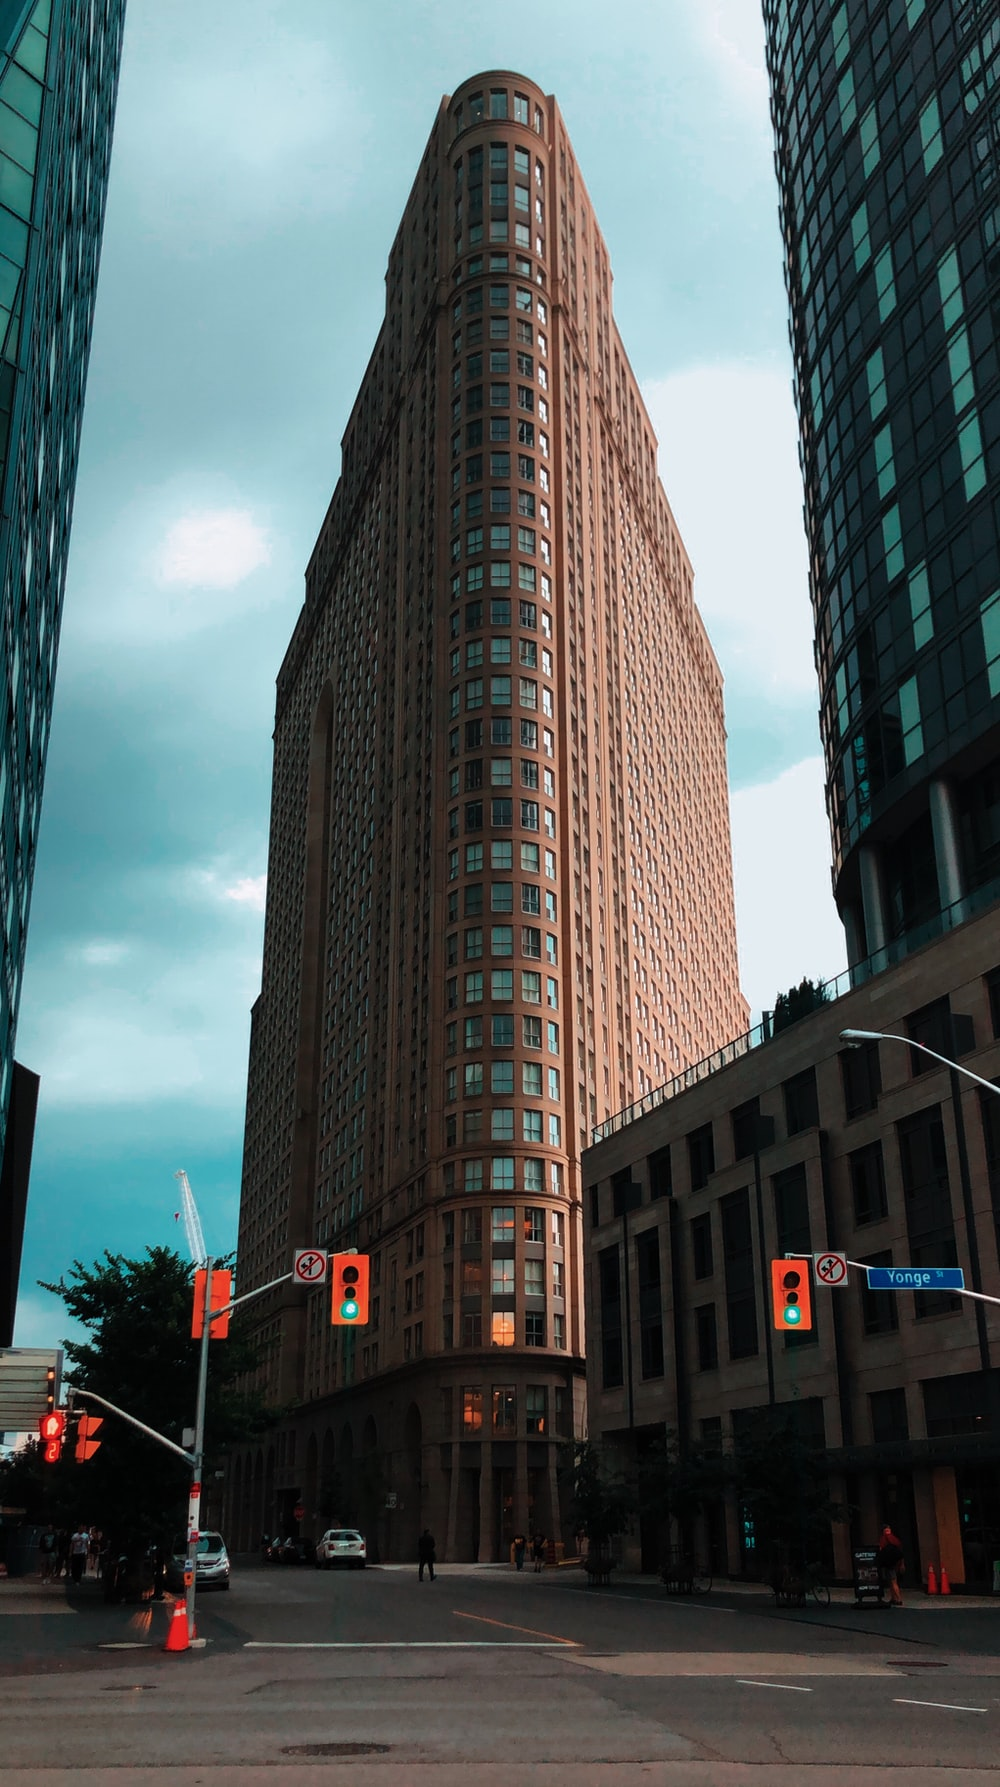 triangular brown building